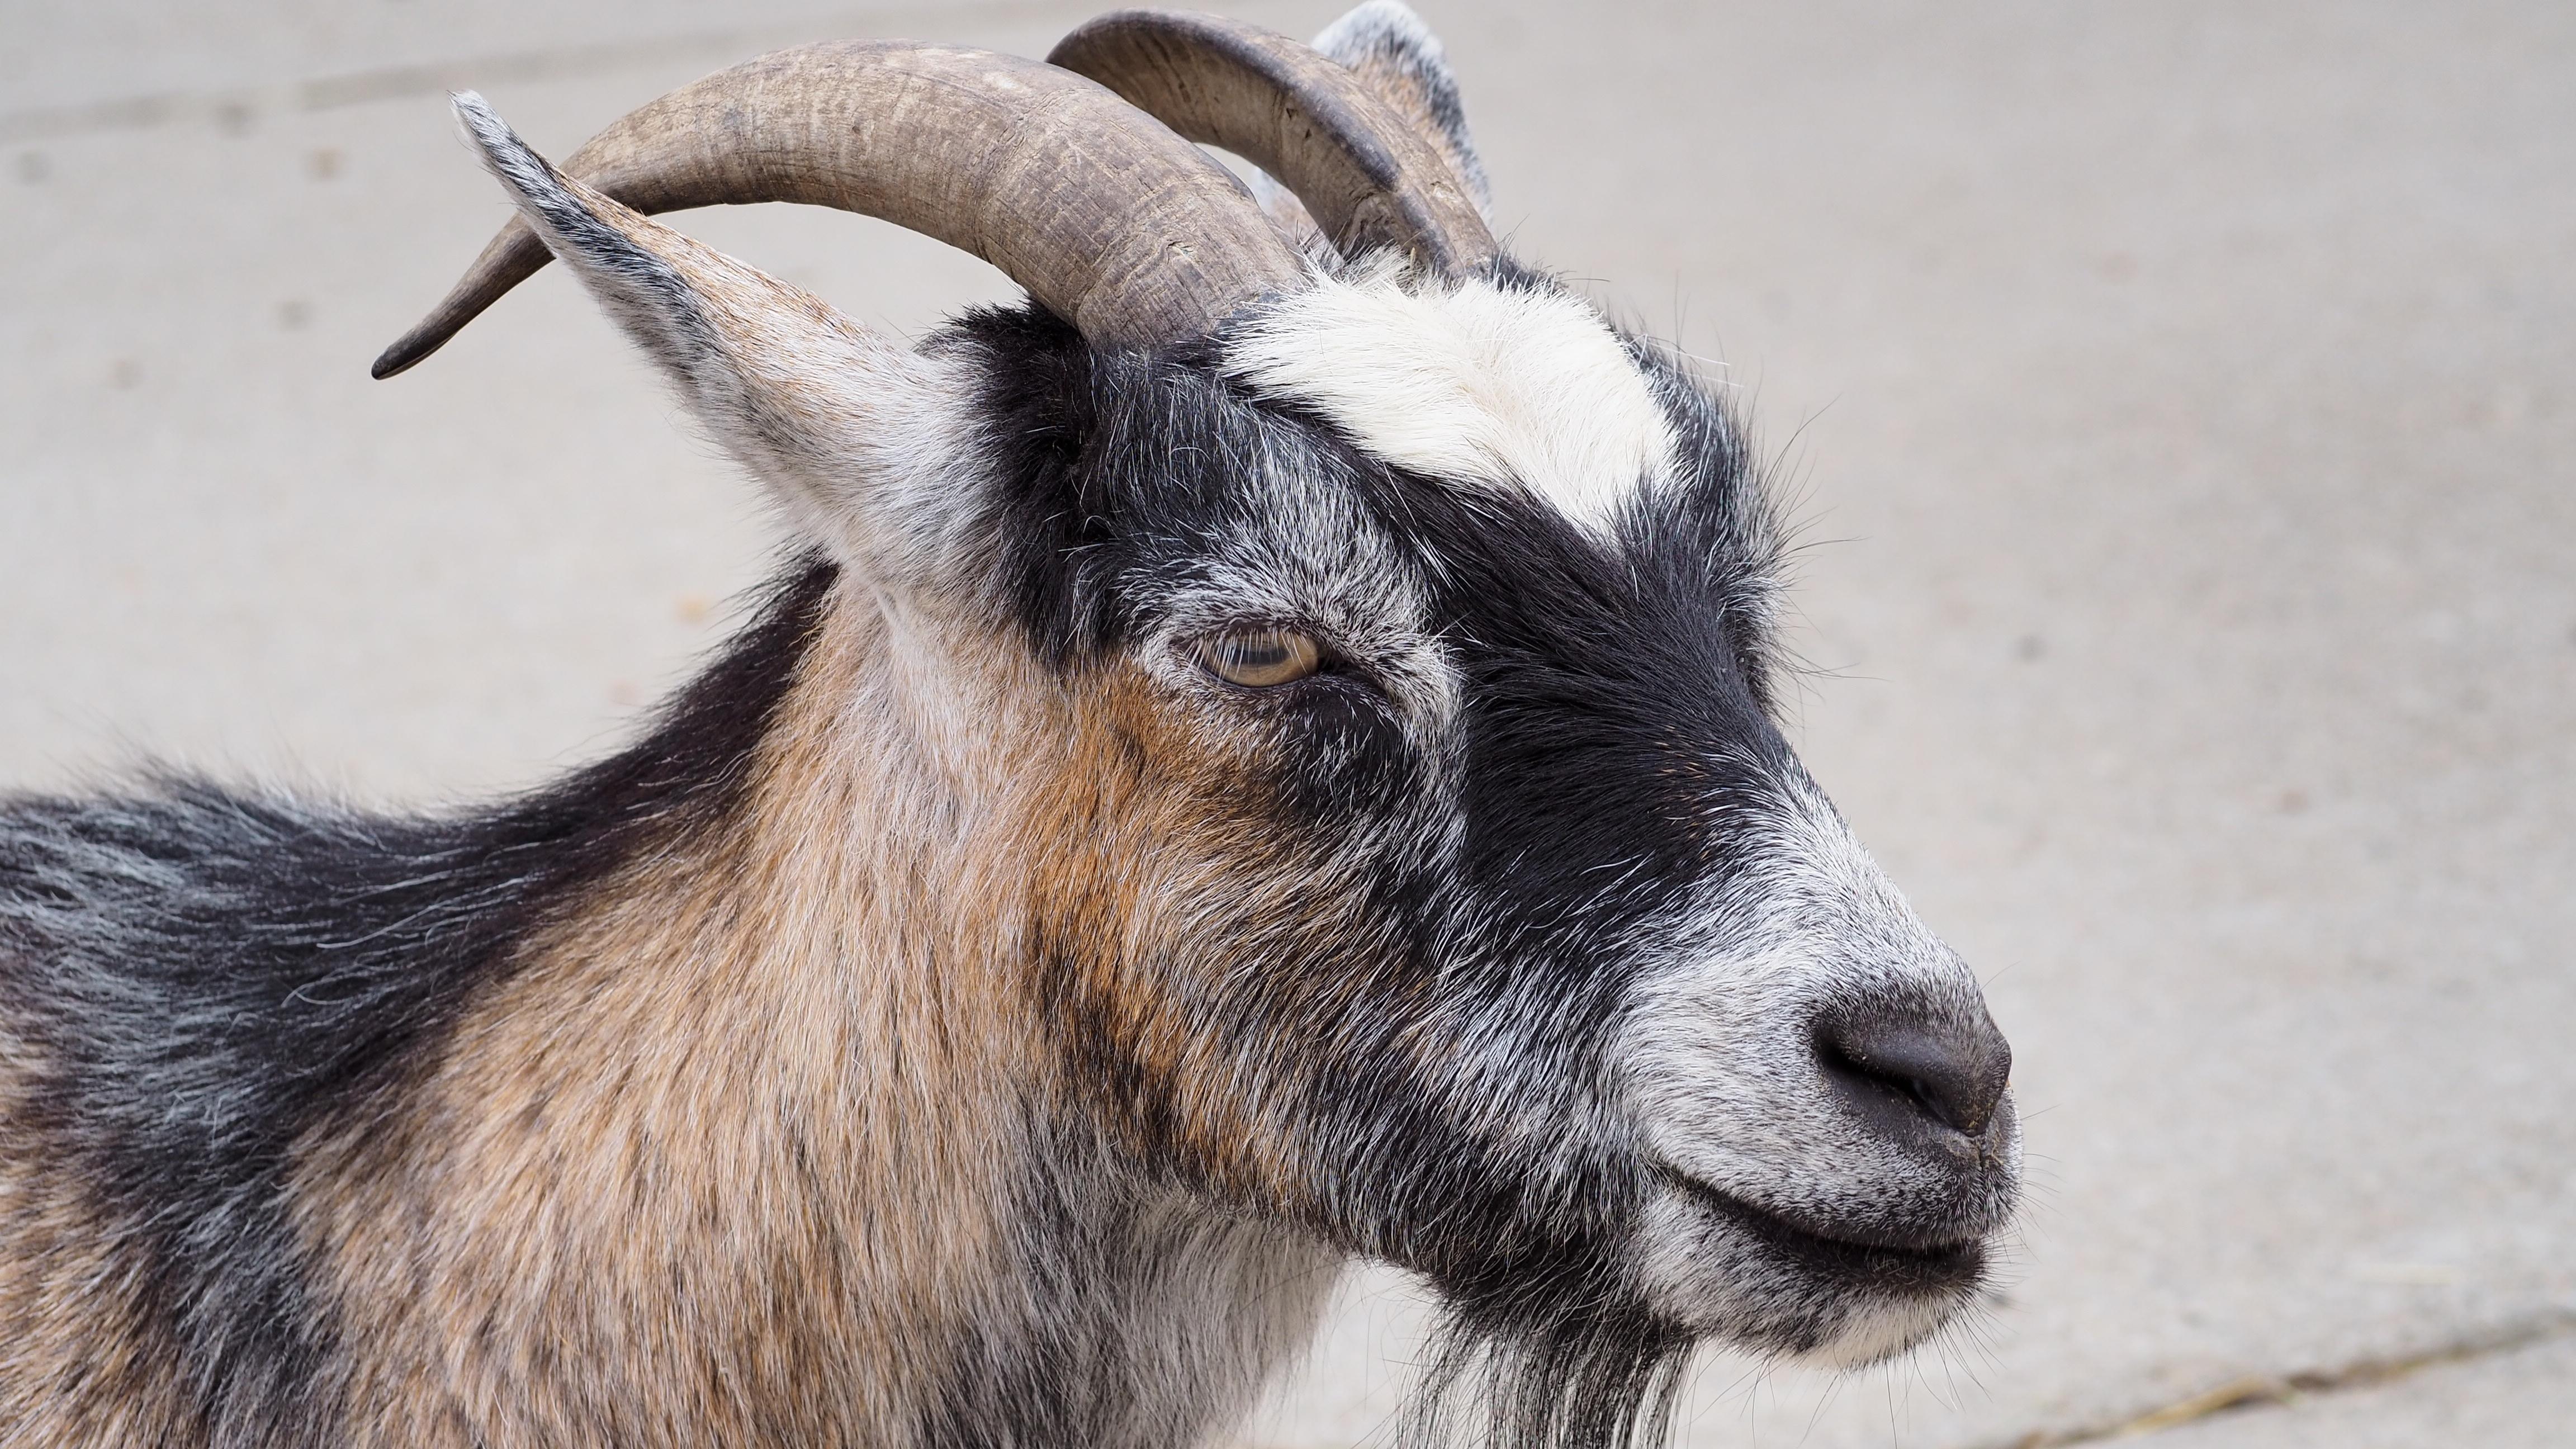 farm-animal-goat-horn-livestock-mammal-fauna-goats-farm-animal-vertebrate-domestic-cow-goat-family-goat-antelope-615143.jpg